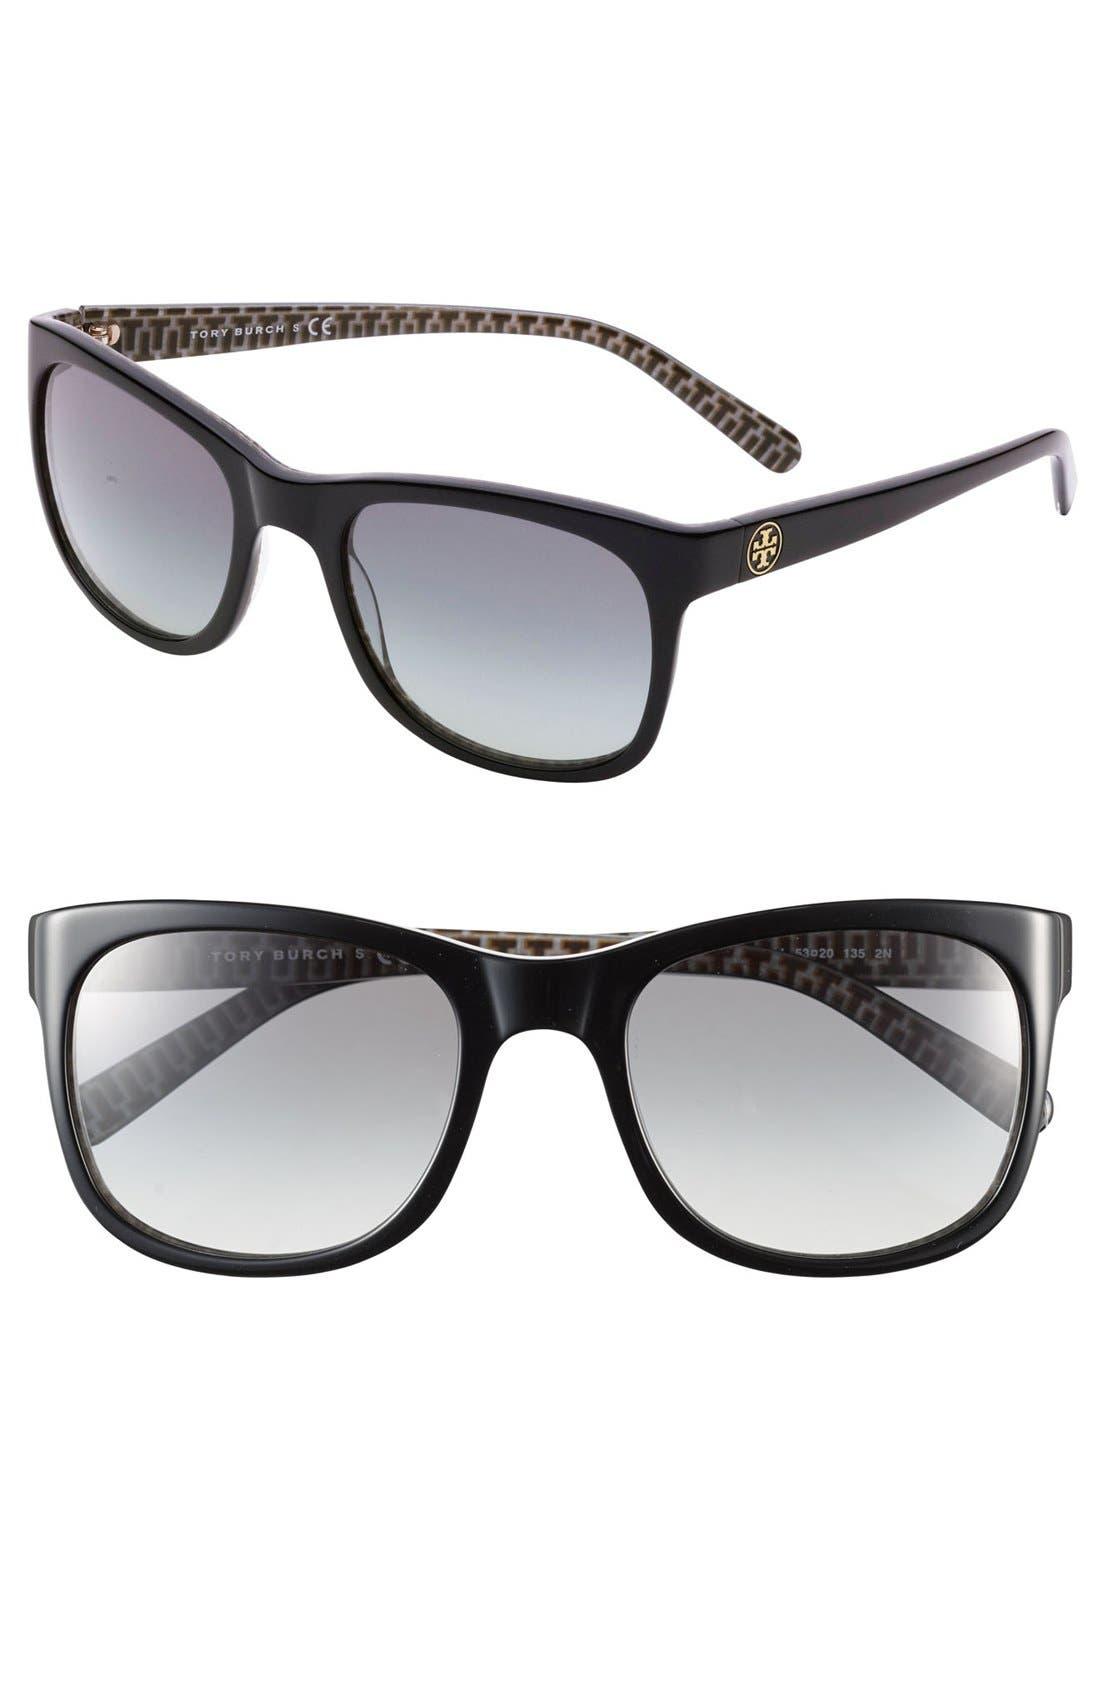 Main Image - Tory Burch 53mm Glam Logo Sunglasses